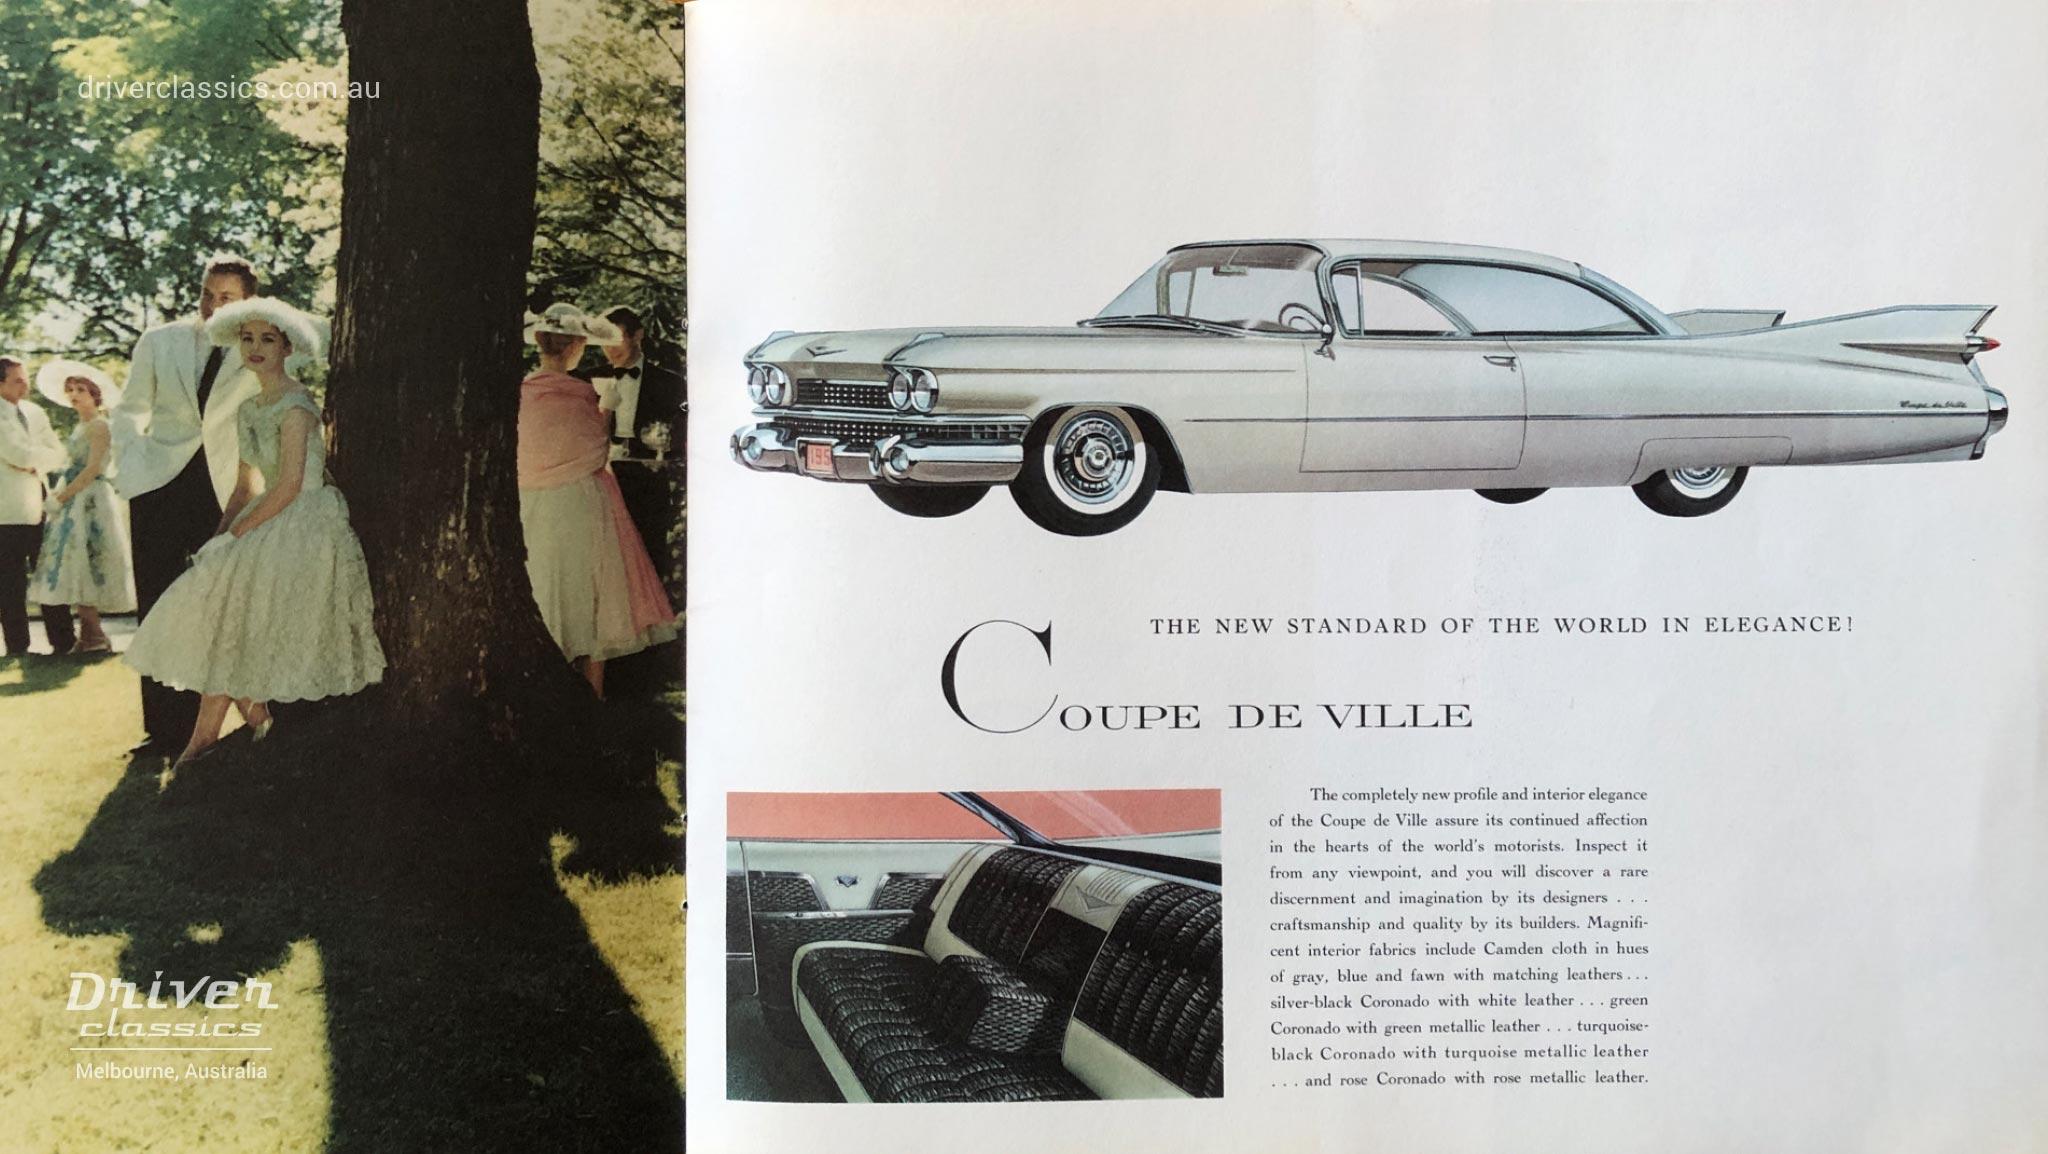 Cadillac Coupe de Ville (1959 version) brochure